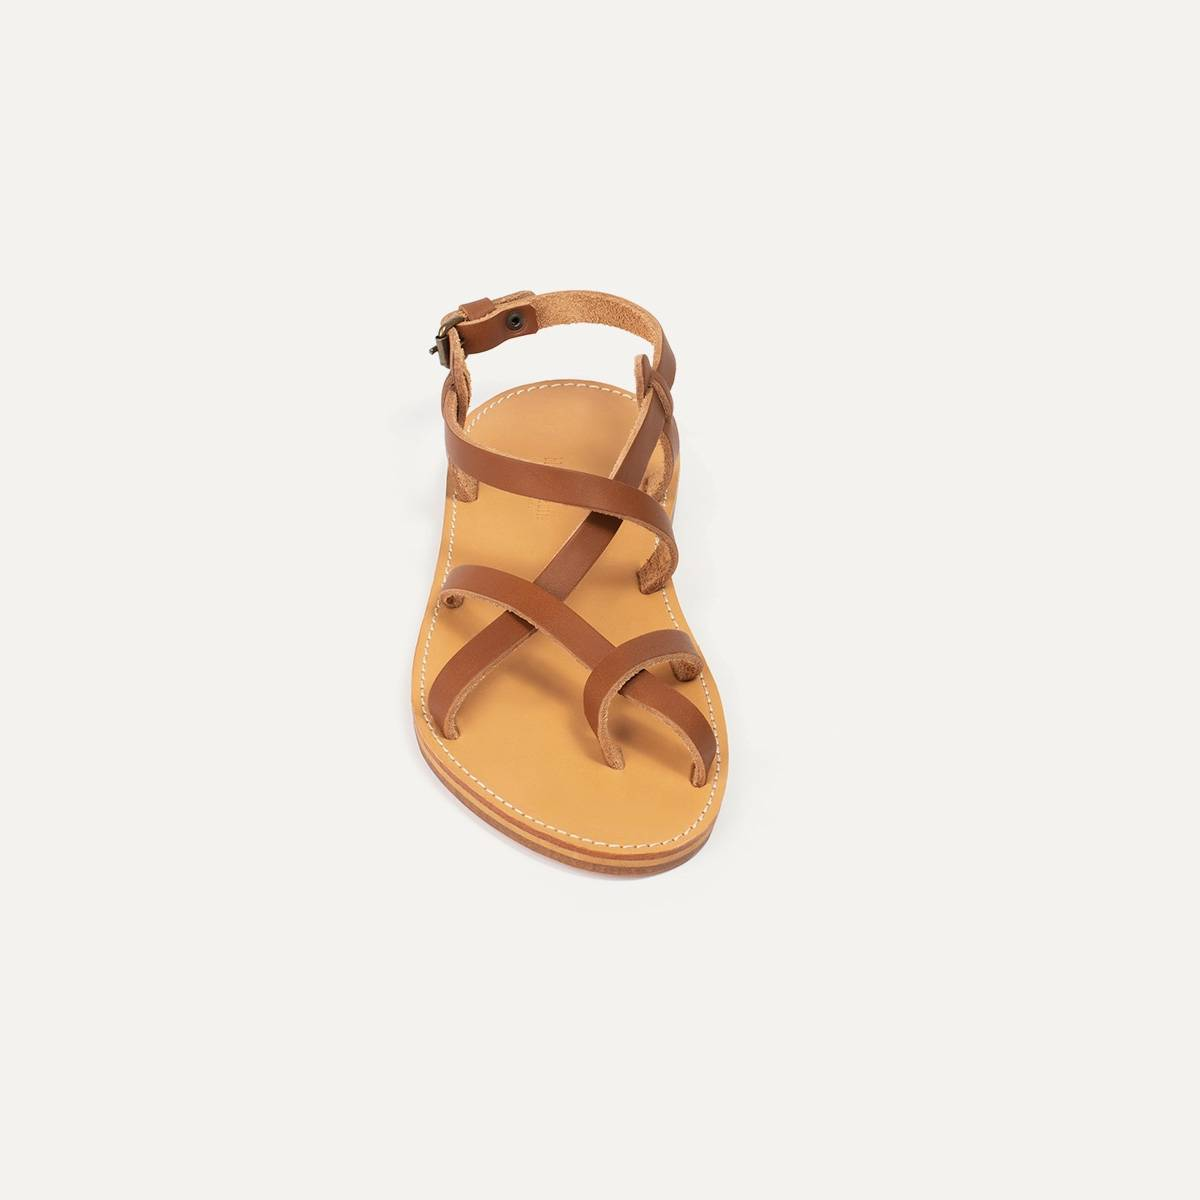 Nara leather sandals - Pain Brûlé (image n°3)